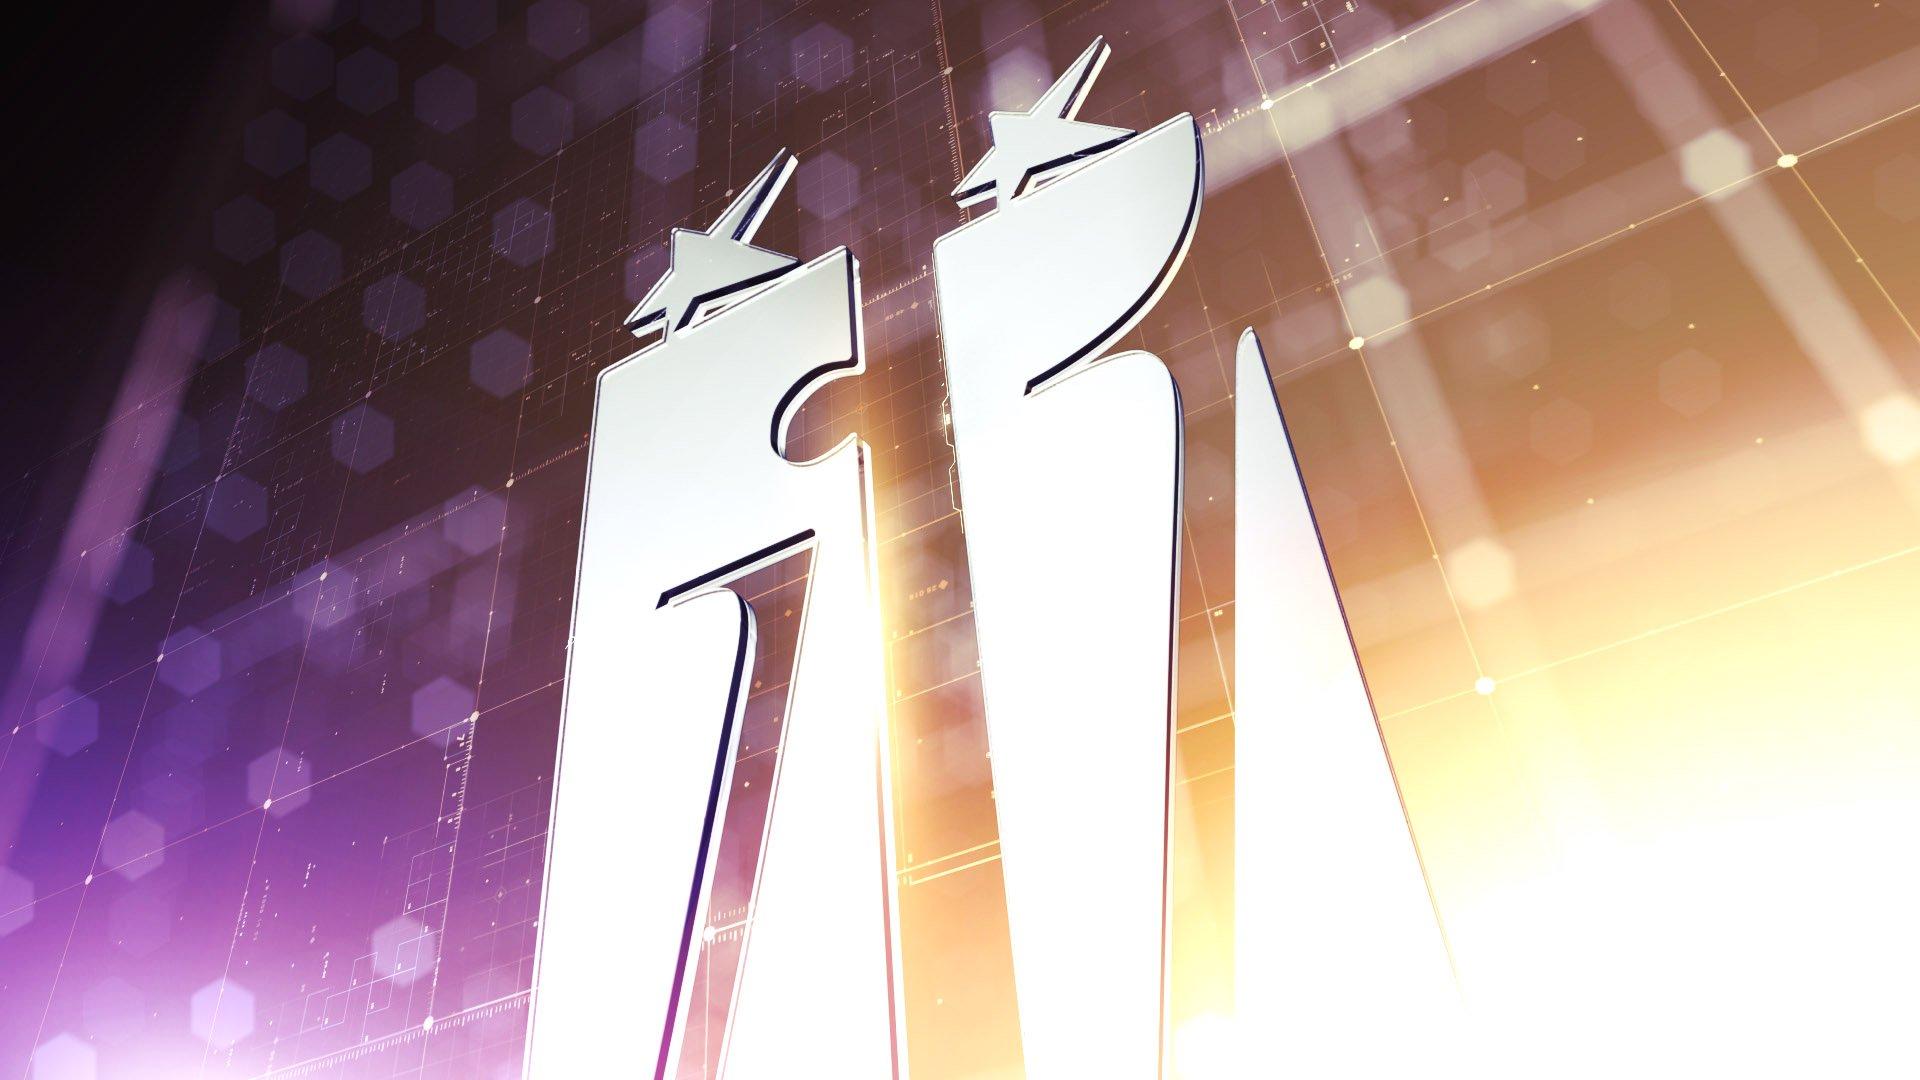 На 21 октября наметили оглашение имен победителей премии IT Stars имени Георгия Генса